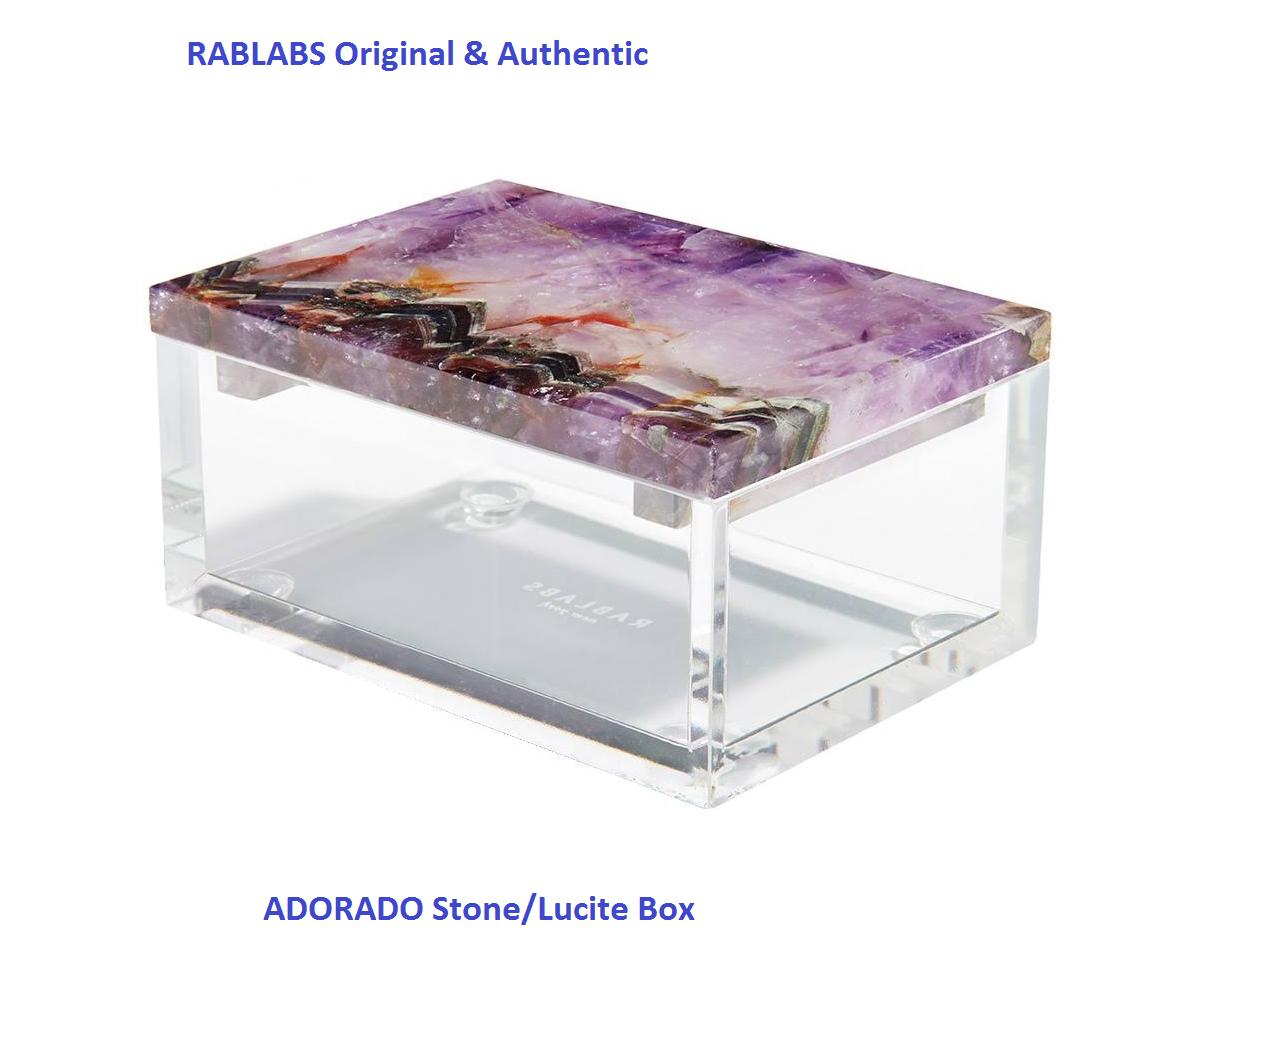 NEUF (Original) rablabs NewYork ADORADO Améthyste Lucite Box Small GENUINE